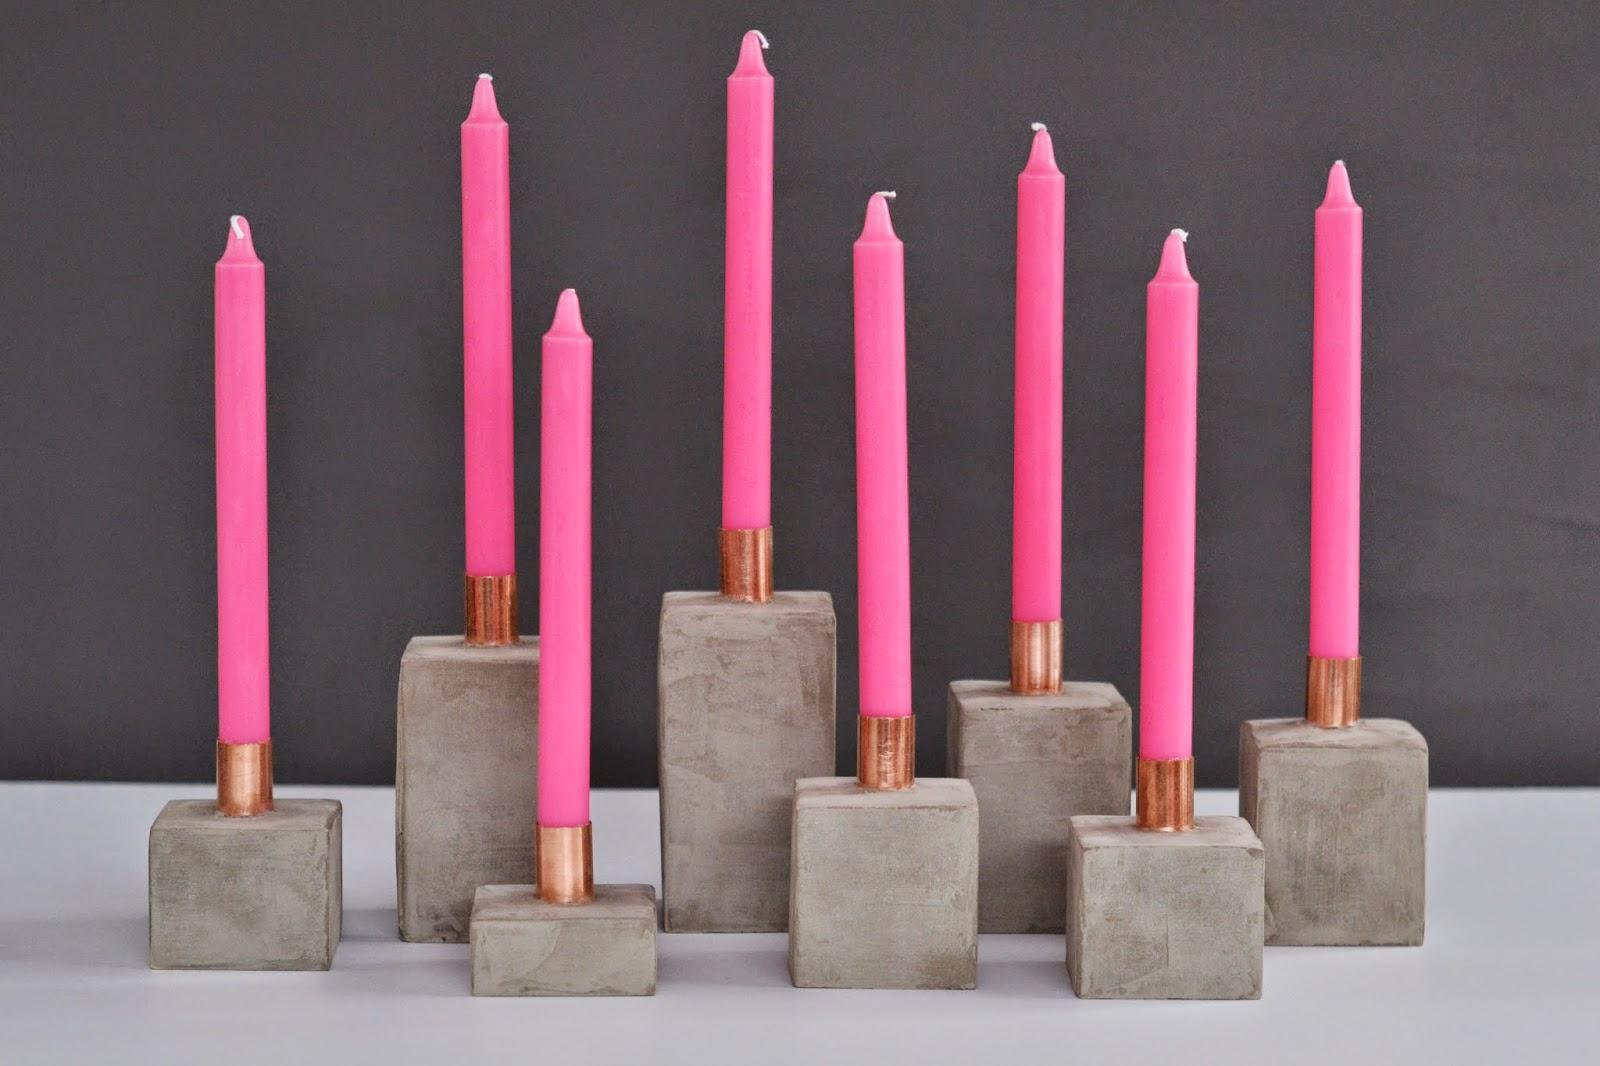 27 concrete copper neon candle holders